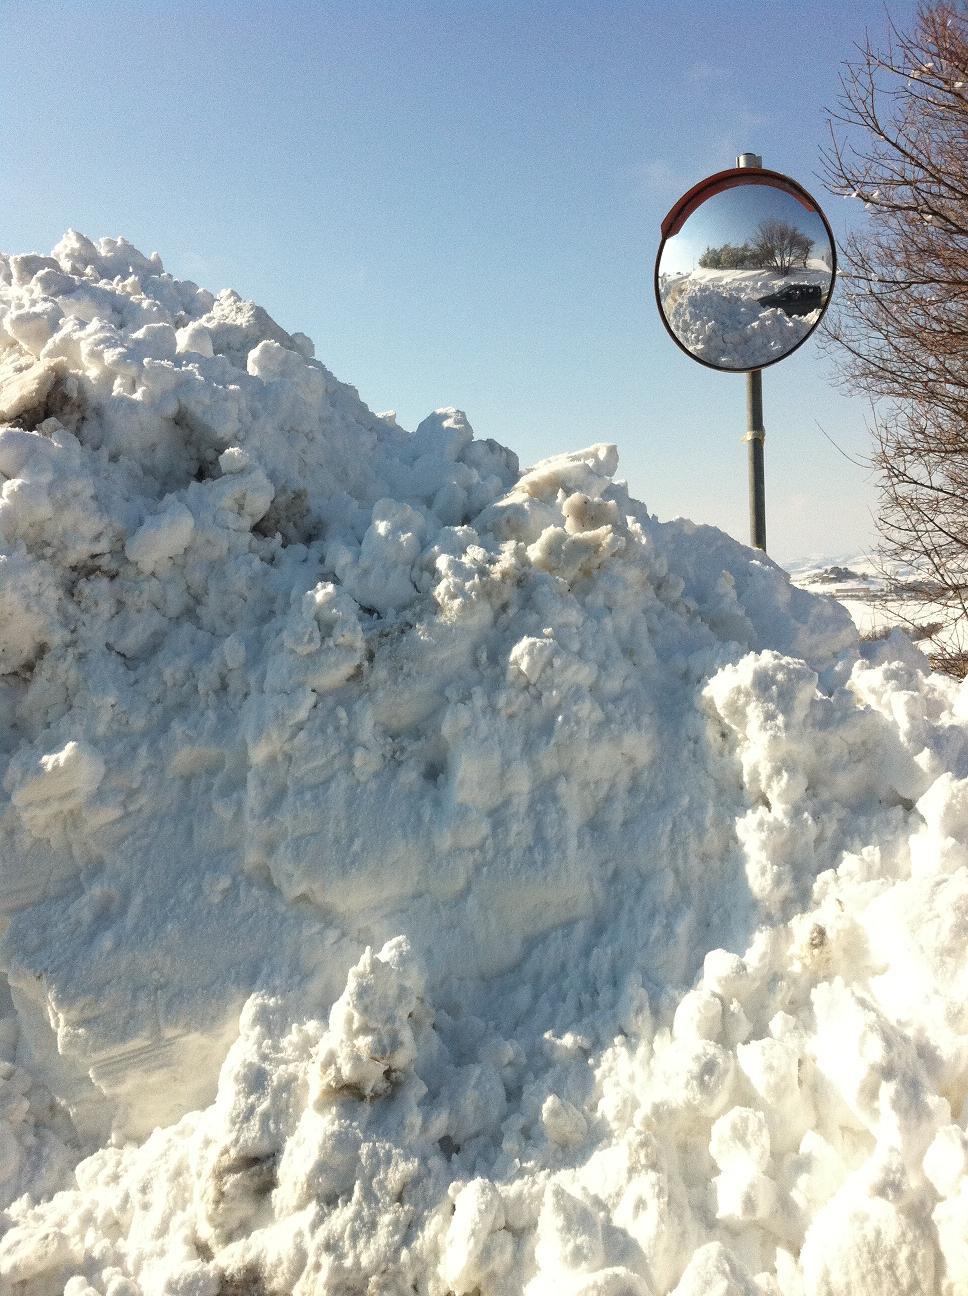 Neve a Ripatransone, 11 febbraio 2012 foto Silvia Basili 2